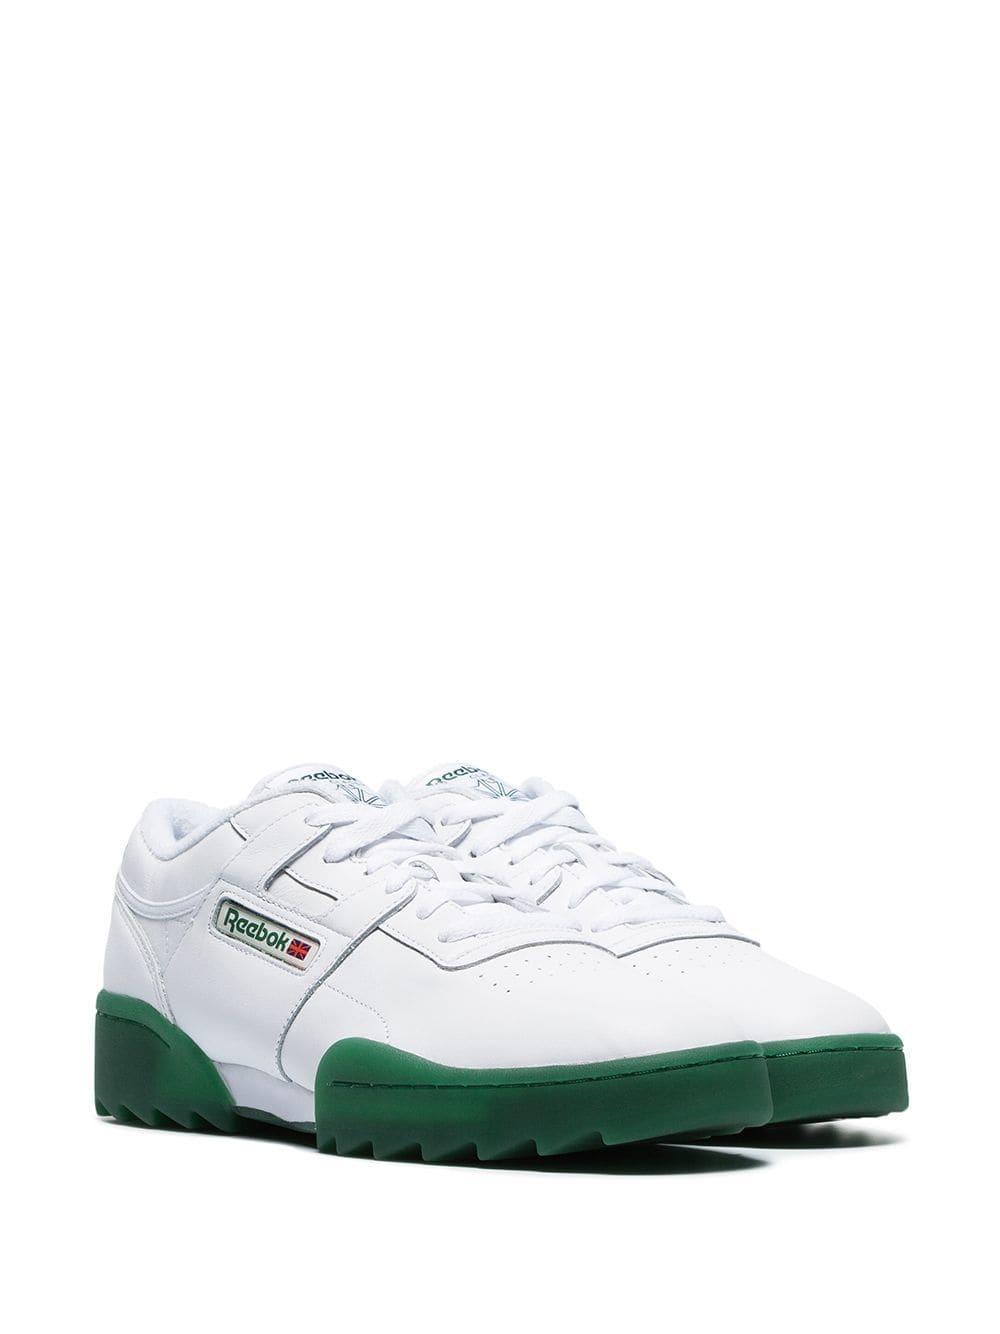 69a1057e067 Reebok - Green Workout Ripple Sneakers for Men - Lyst. View fullscreen